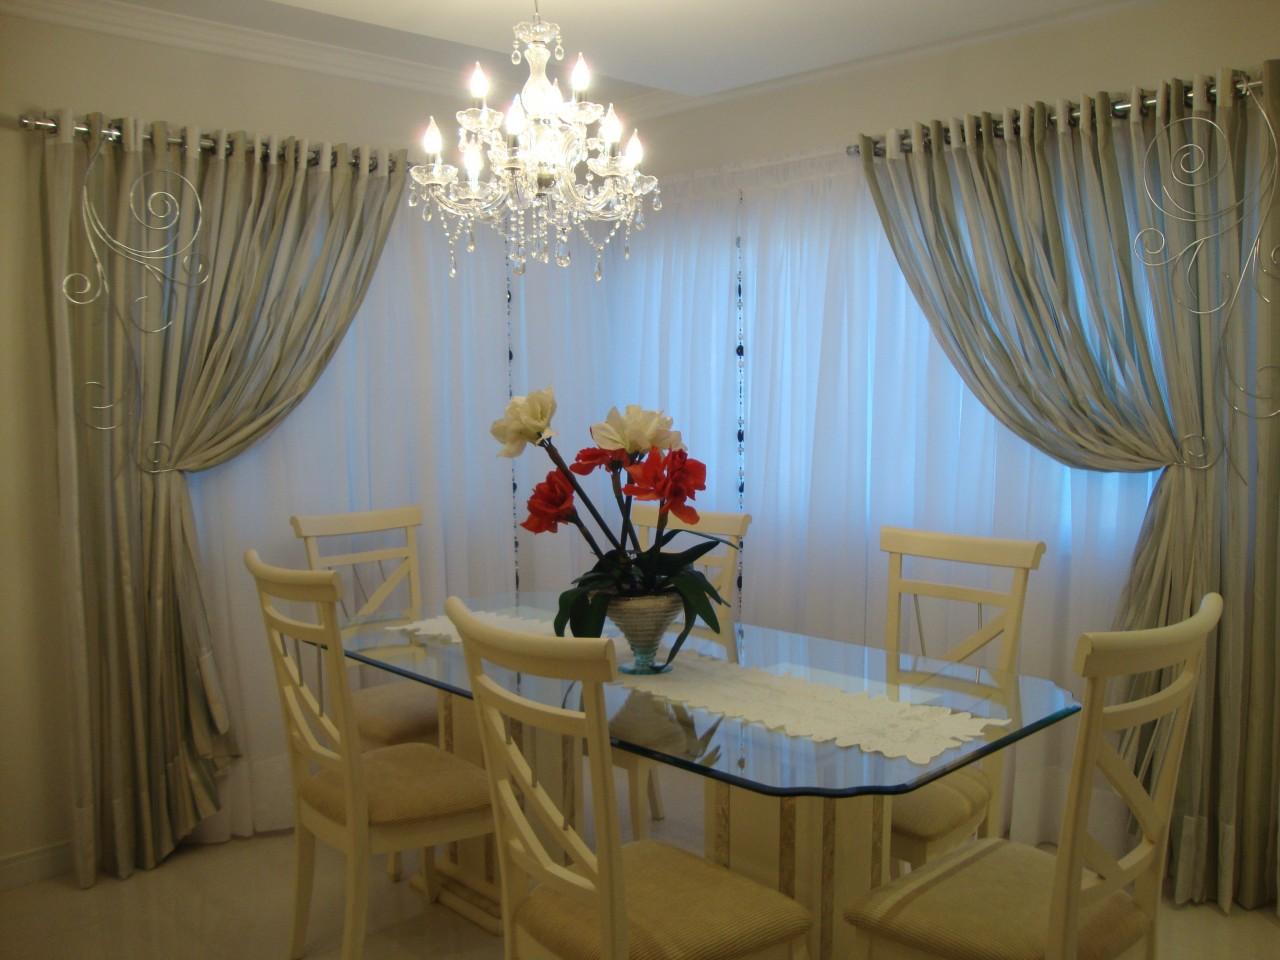 Artlux cortinas e persianas for Cortinas de visillo para sala